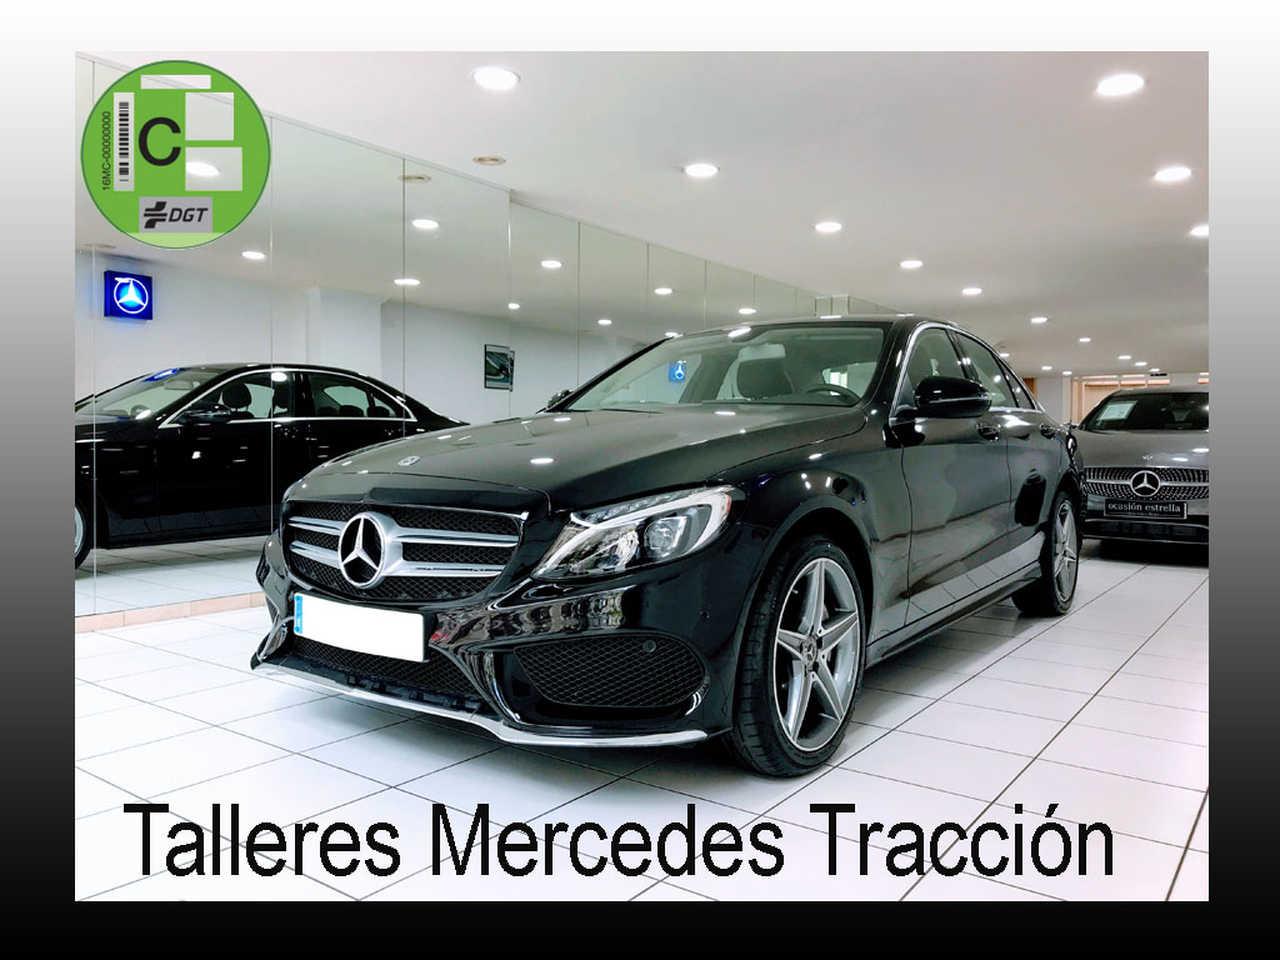 "Mercedes Clase C 220 d AMG Line 9G/Navegación/Parktronic/Llanta 18""   - Foto 1"